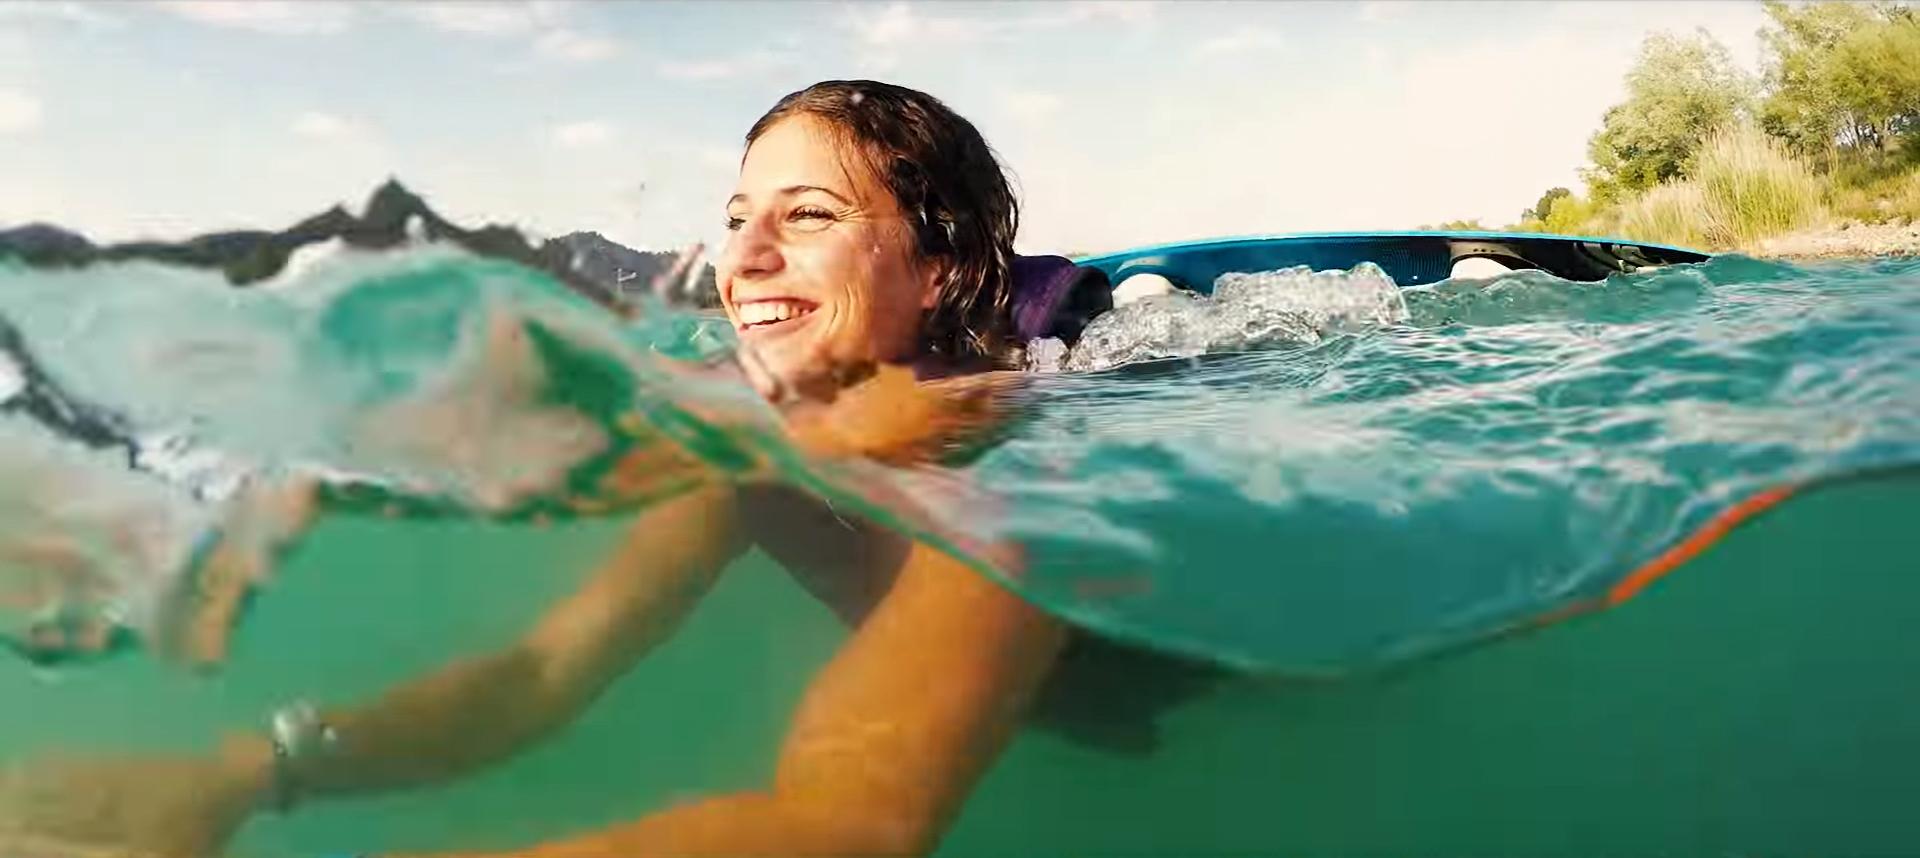 Girls of Wakeboarding